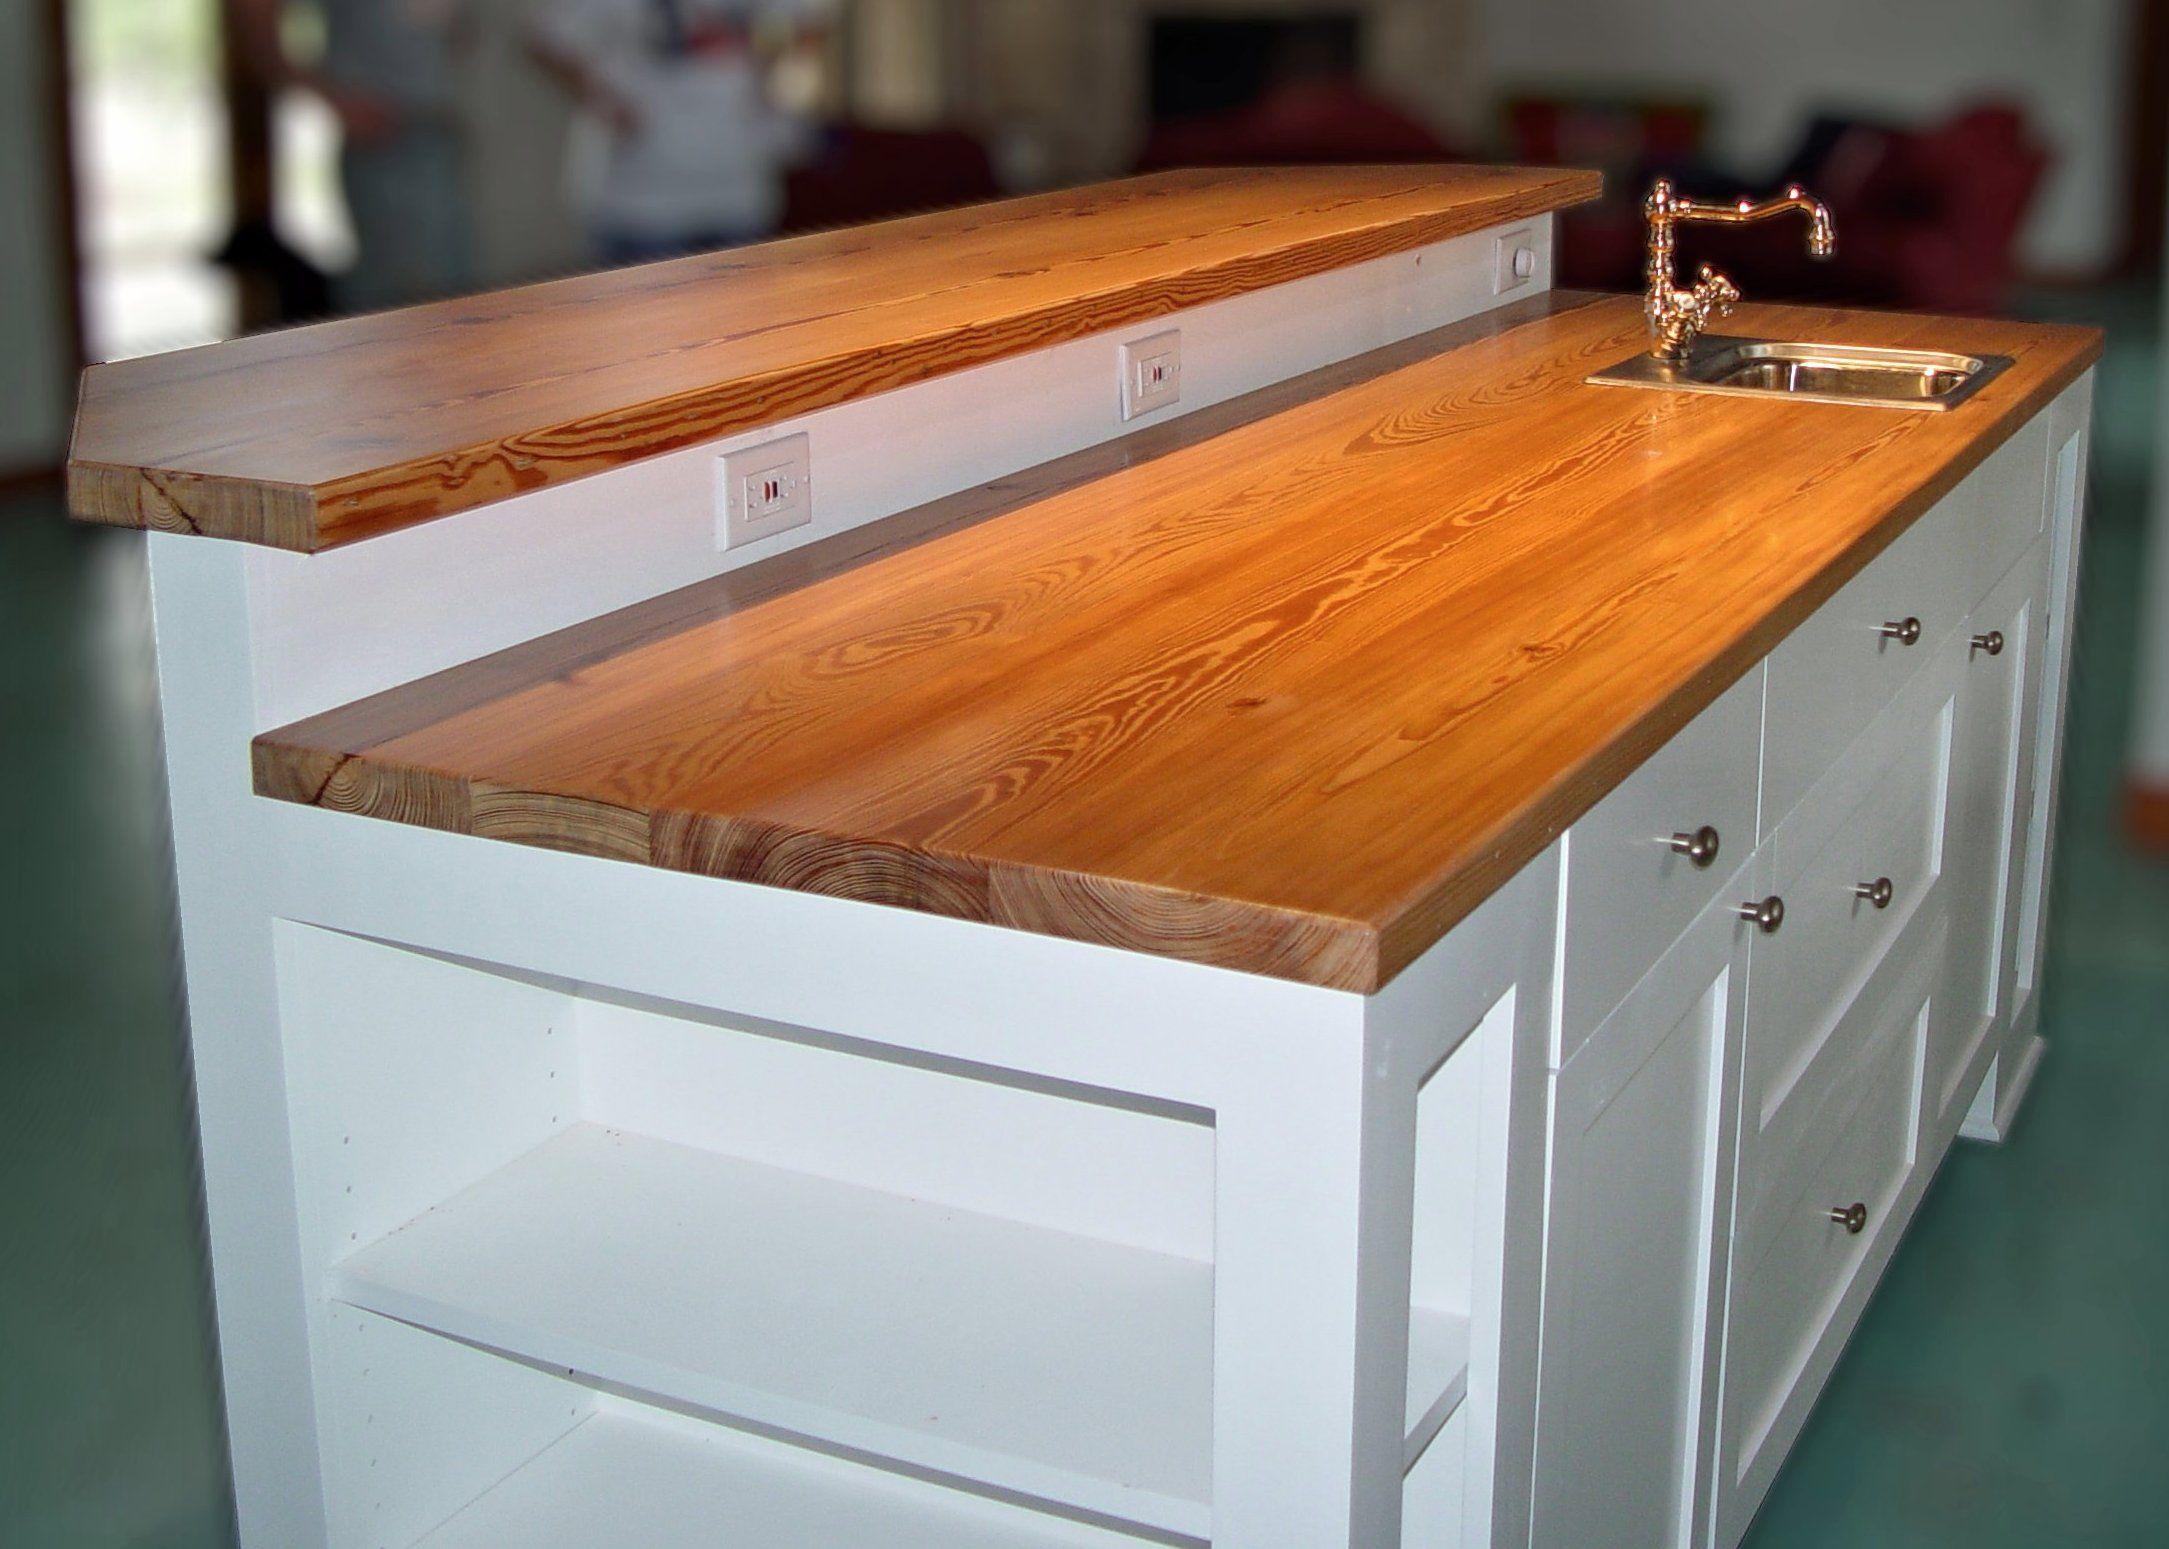 Reclaimed Longleaf Pine Face Grain Custom Wood Counter Top And Bar Top.